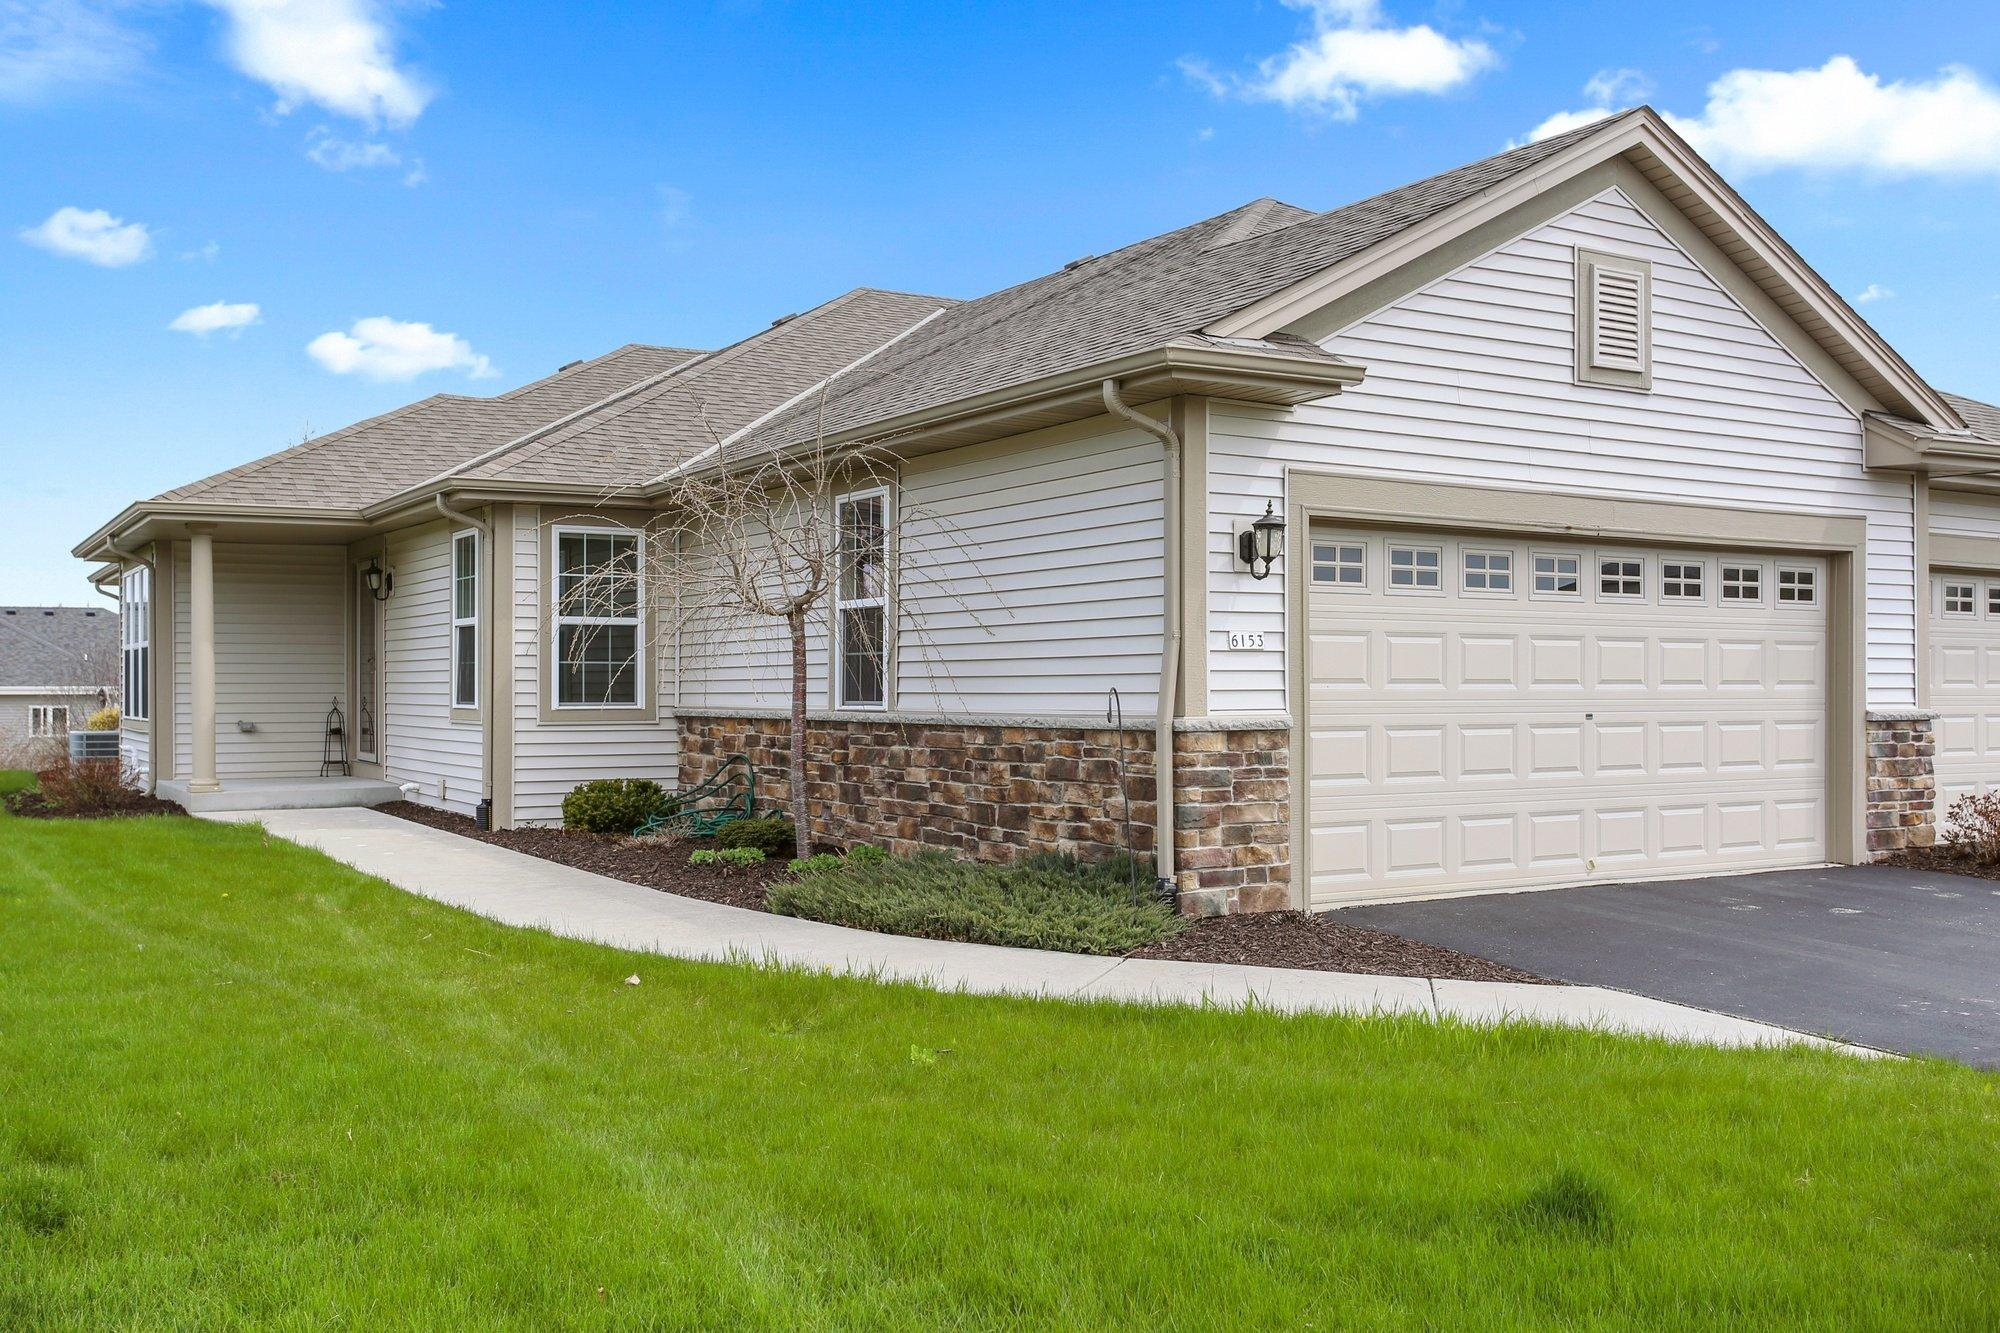 6153 Prairie Cir, Caledonia, Wisconsin 53406, 2 Bedrooms Bedrooms, 5 Rooms Rooms,2 BathroomsBathrooms,Condominiums,For Sale,Prairie Cir,1,1687514